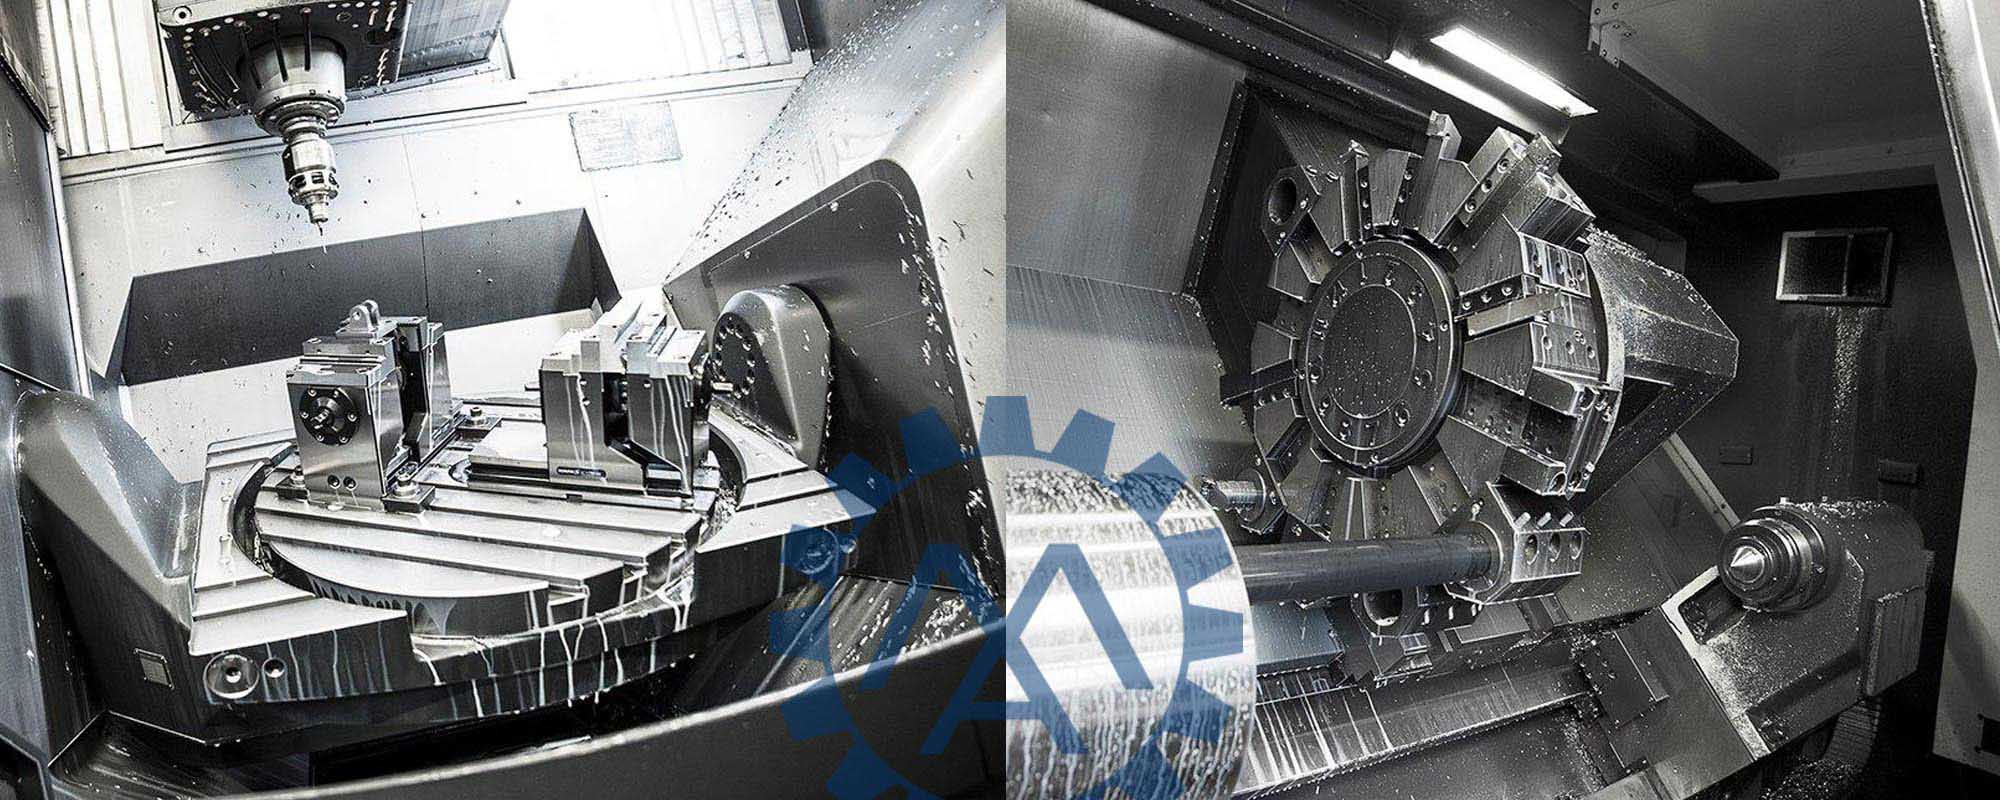 Alois Maibaum | Metallbearbeitung